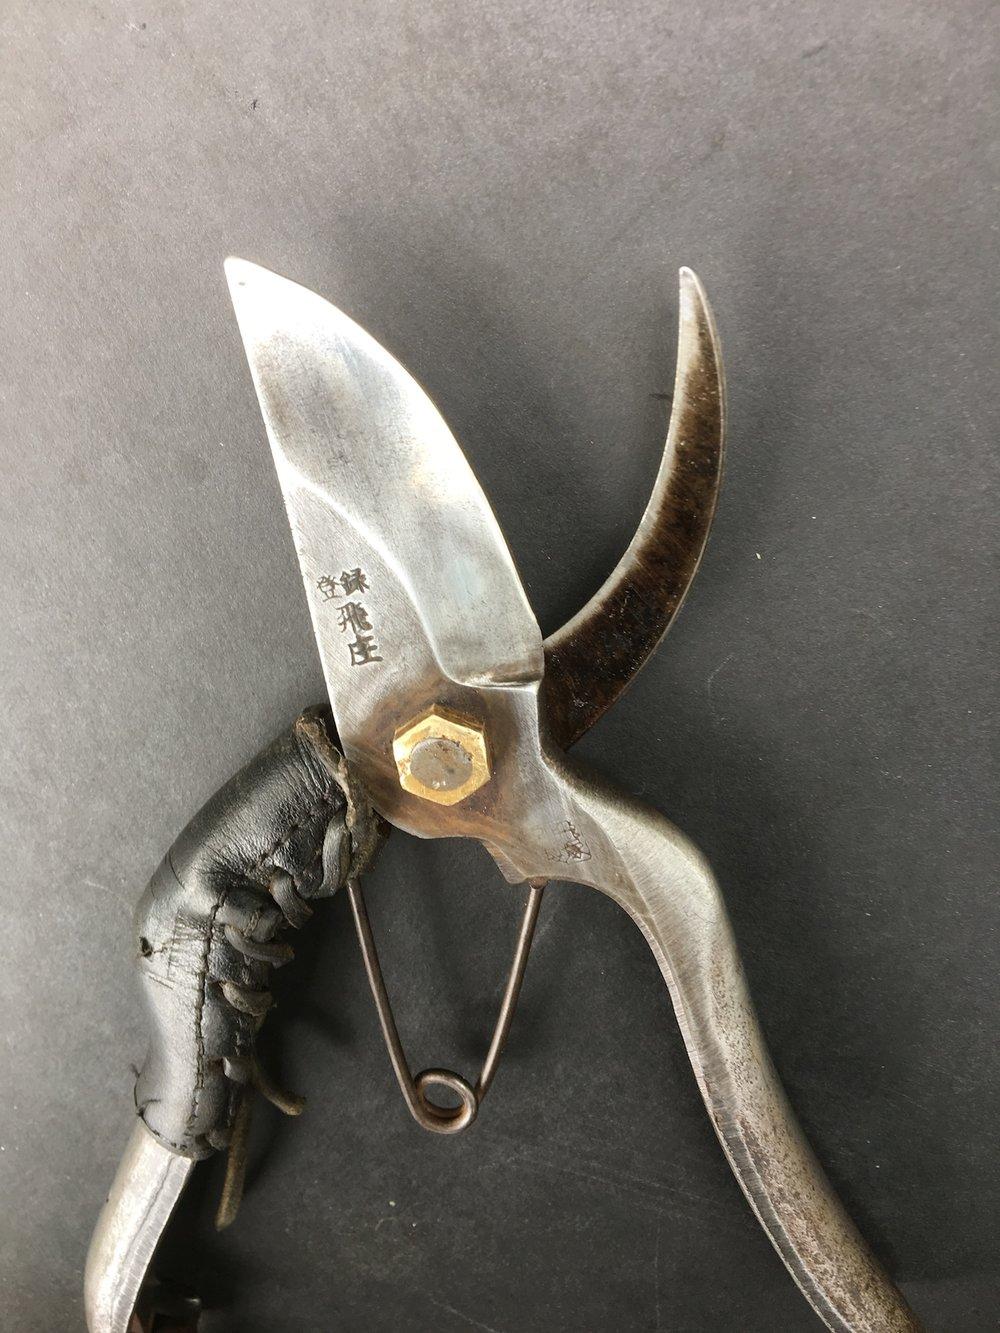 Scissor repair low res after.JPG